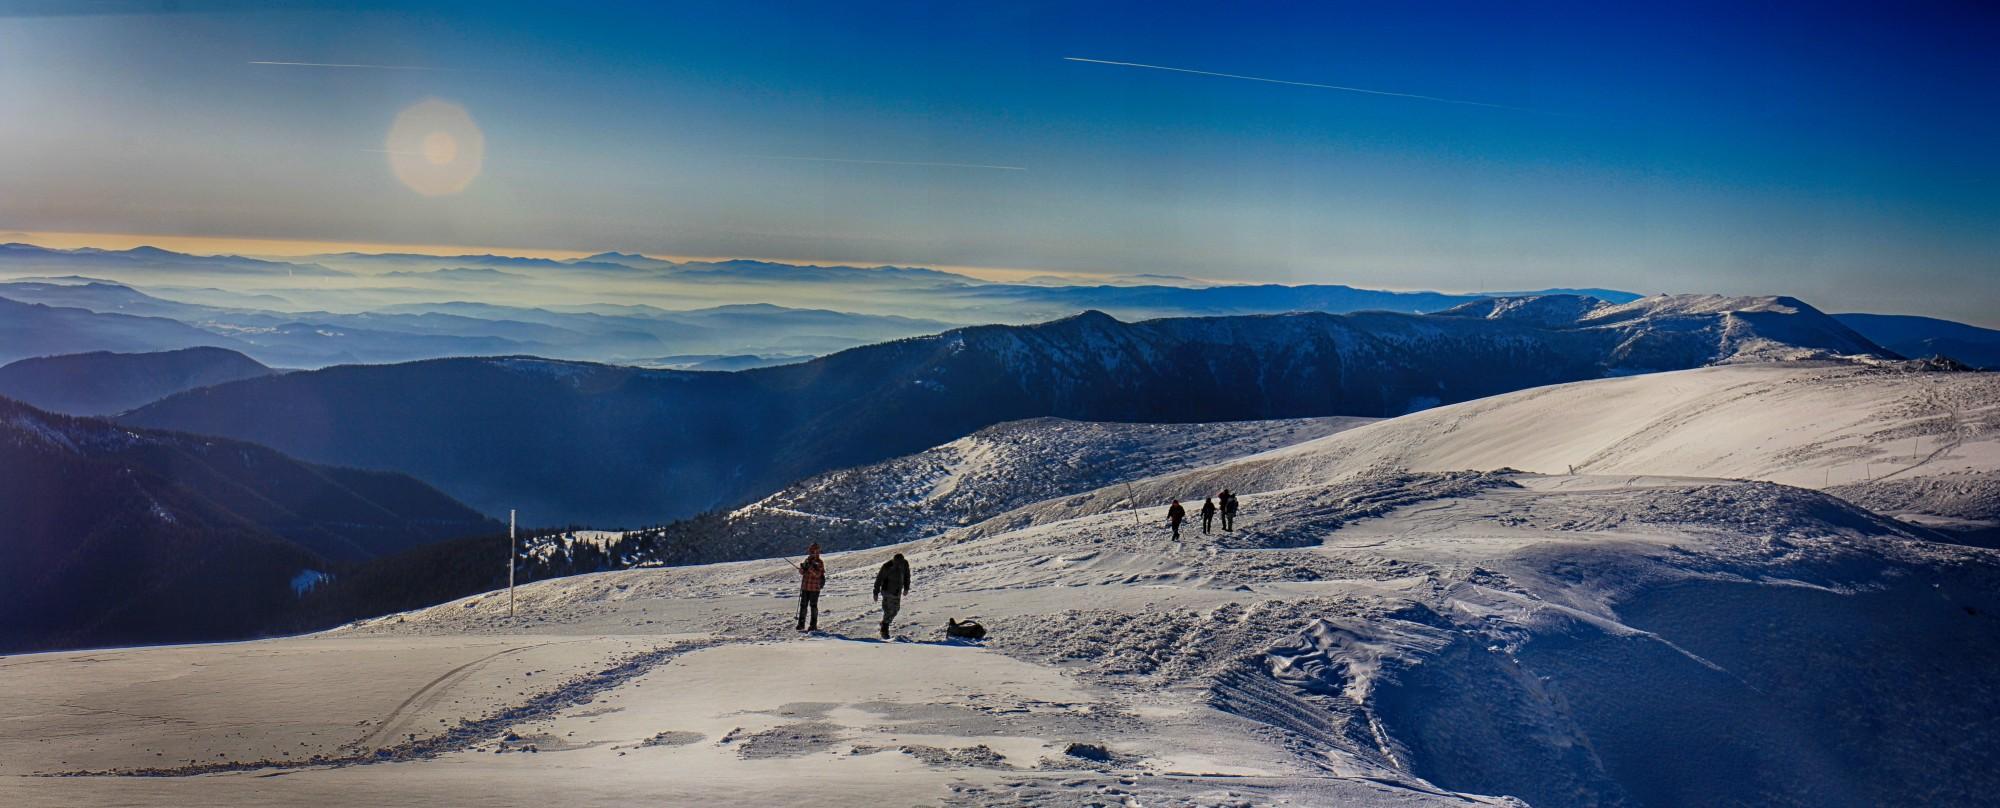 Nízke_Tatry_-_Chabenec_30.12.2016__(143)_panorama.jpg